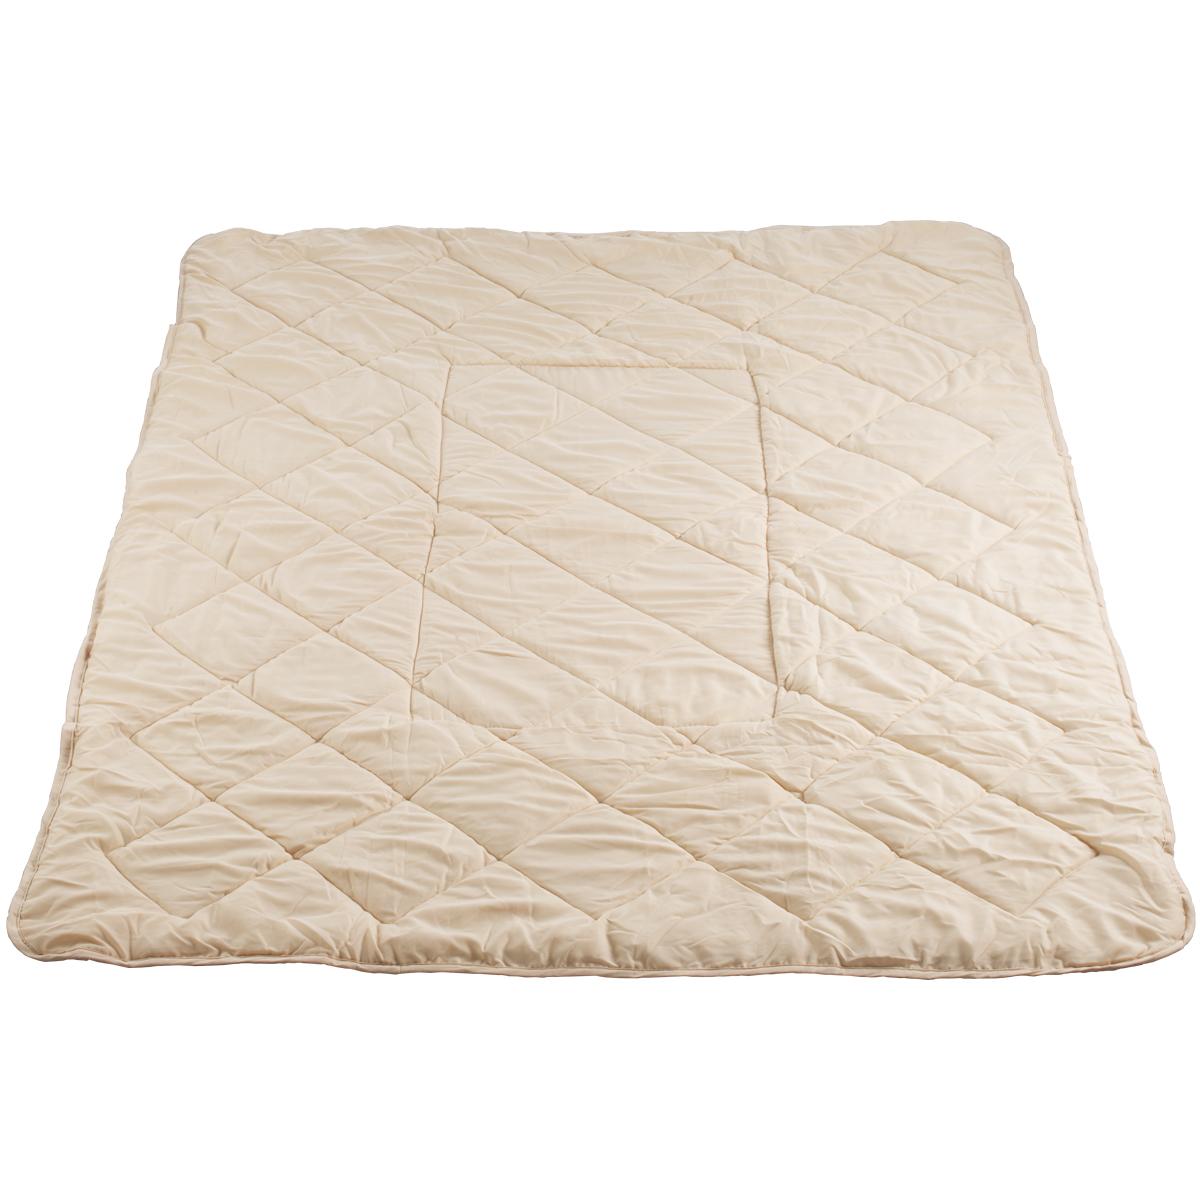 Jml Quishion 2 In 1 Combination Quilt Blanket Amp Cushion